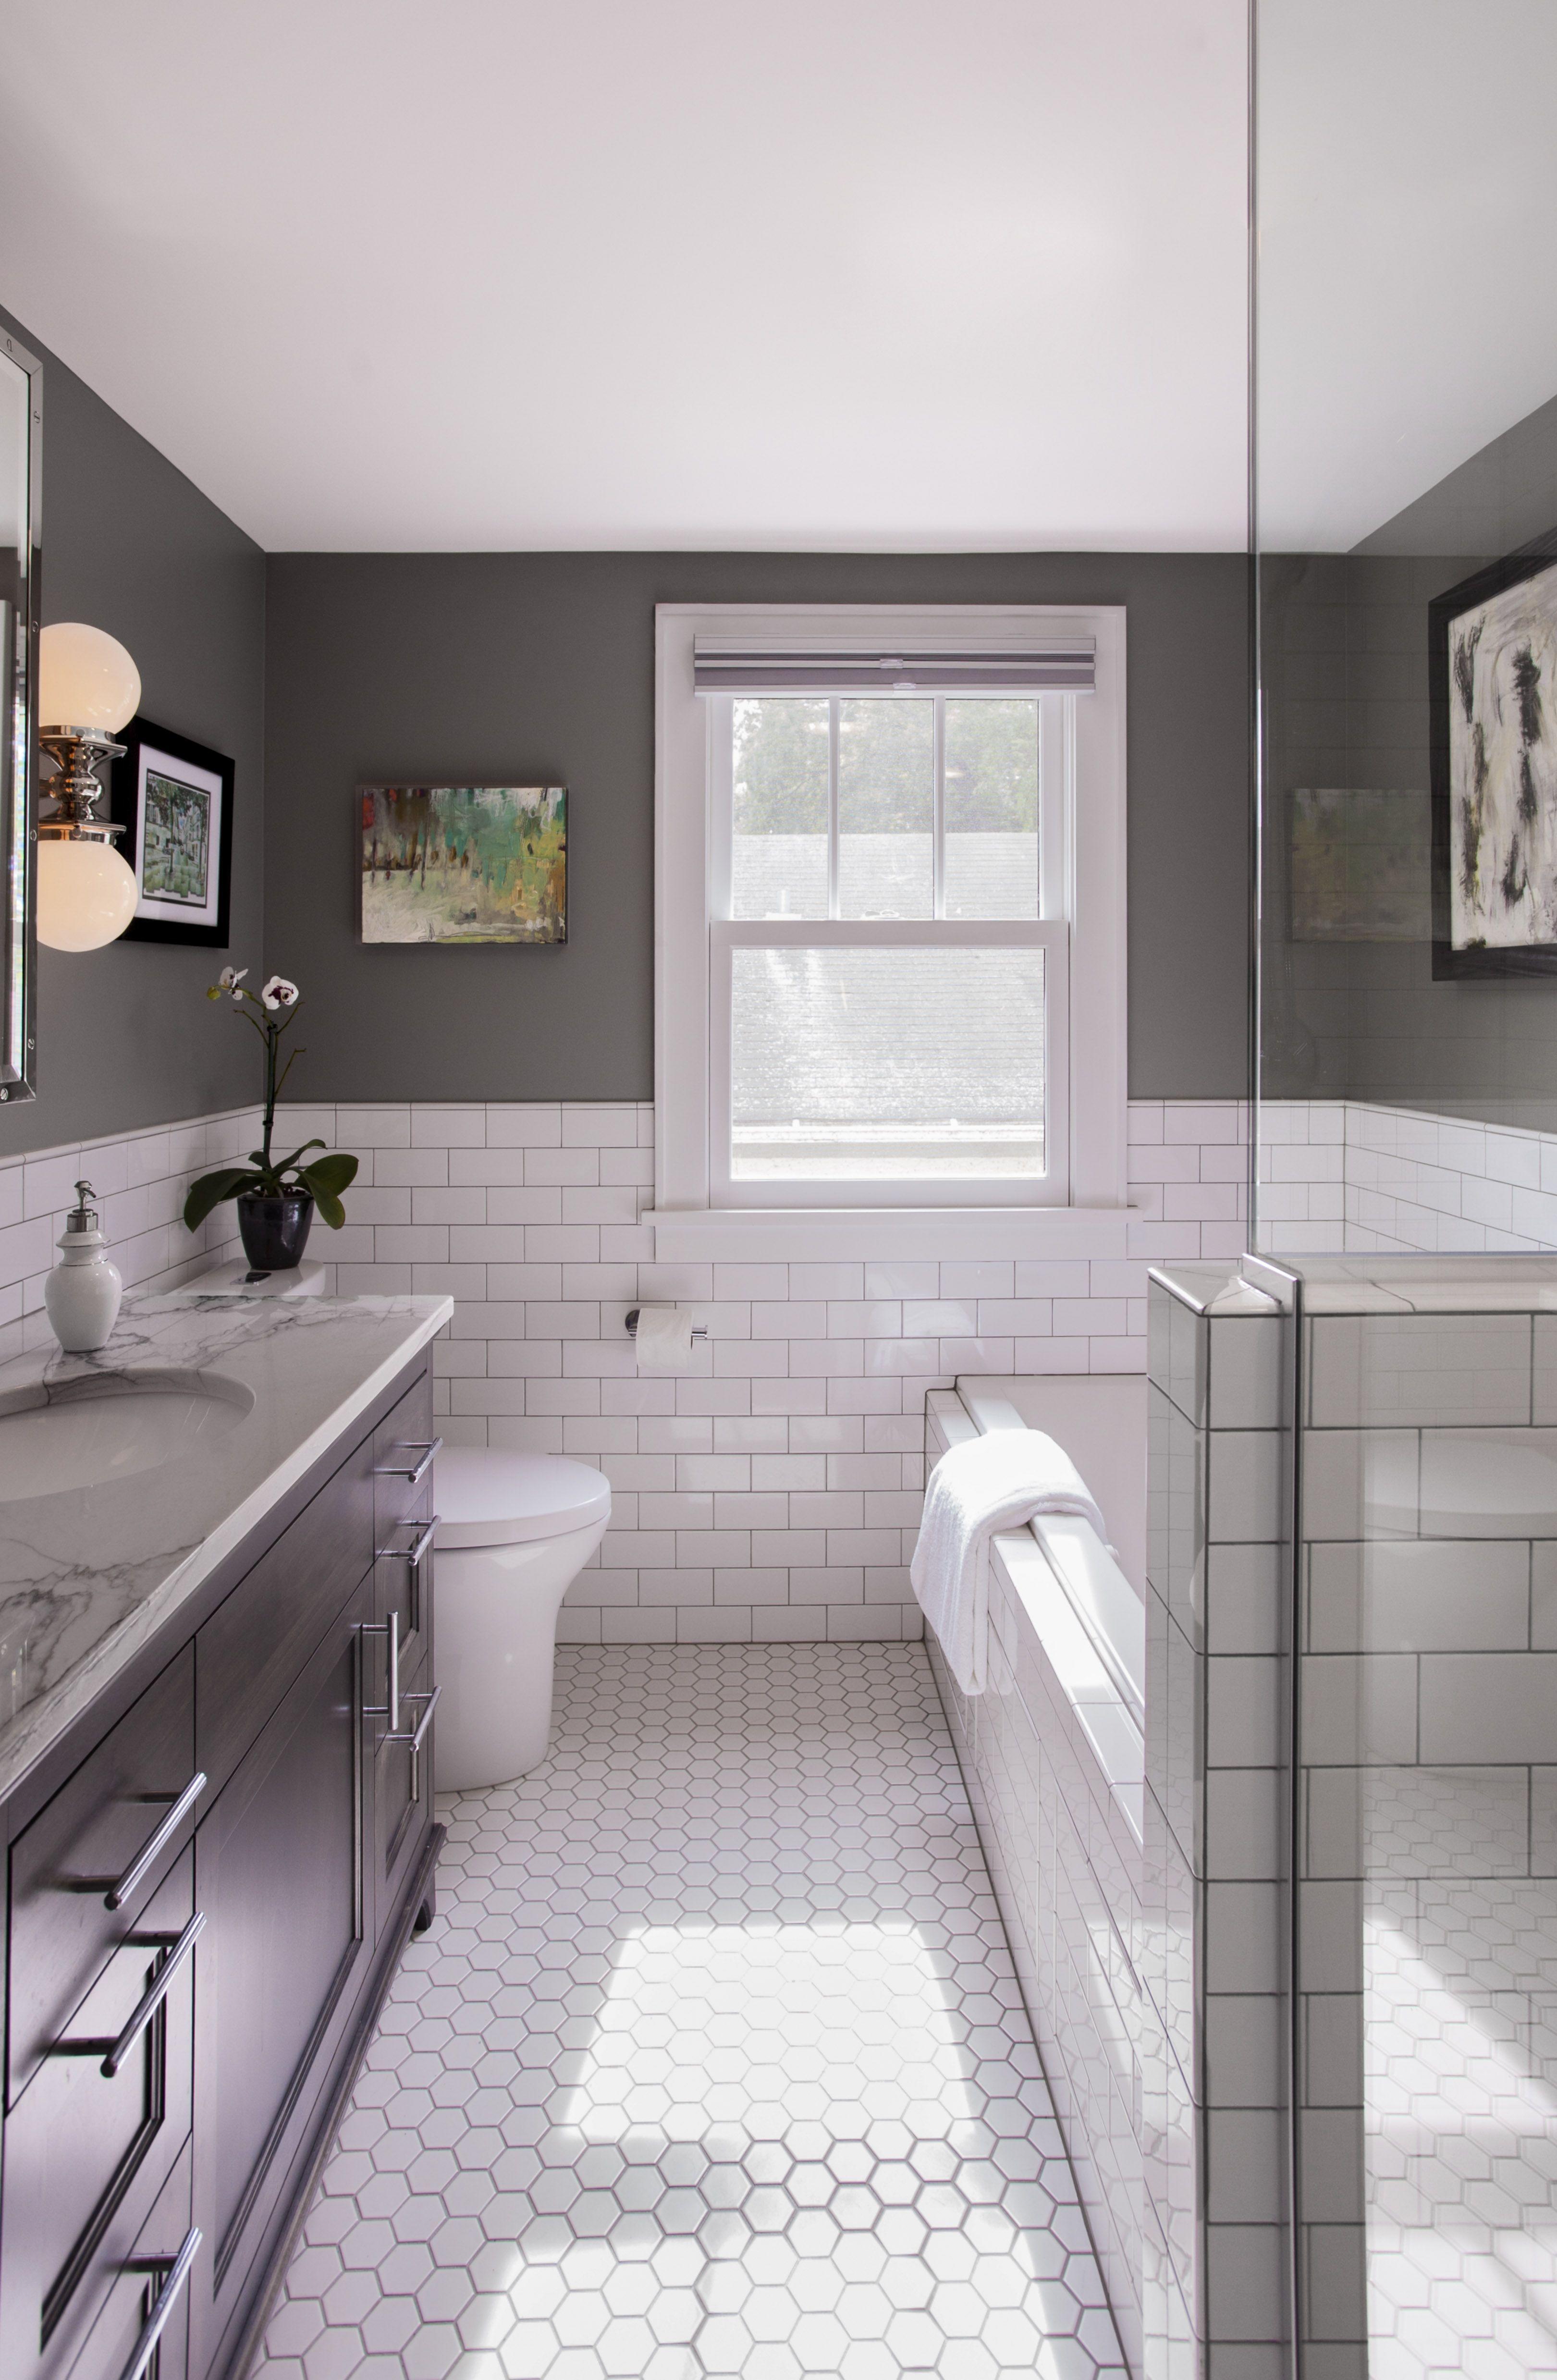 Fascinating Small Attic Bathroom Design Ideas10